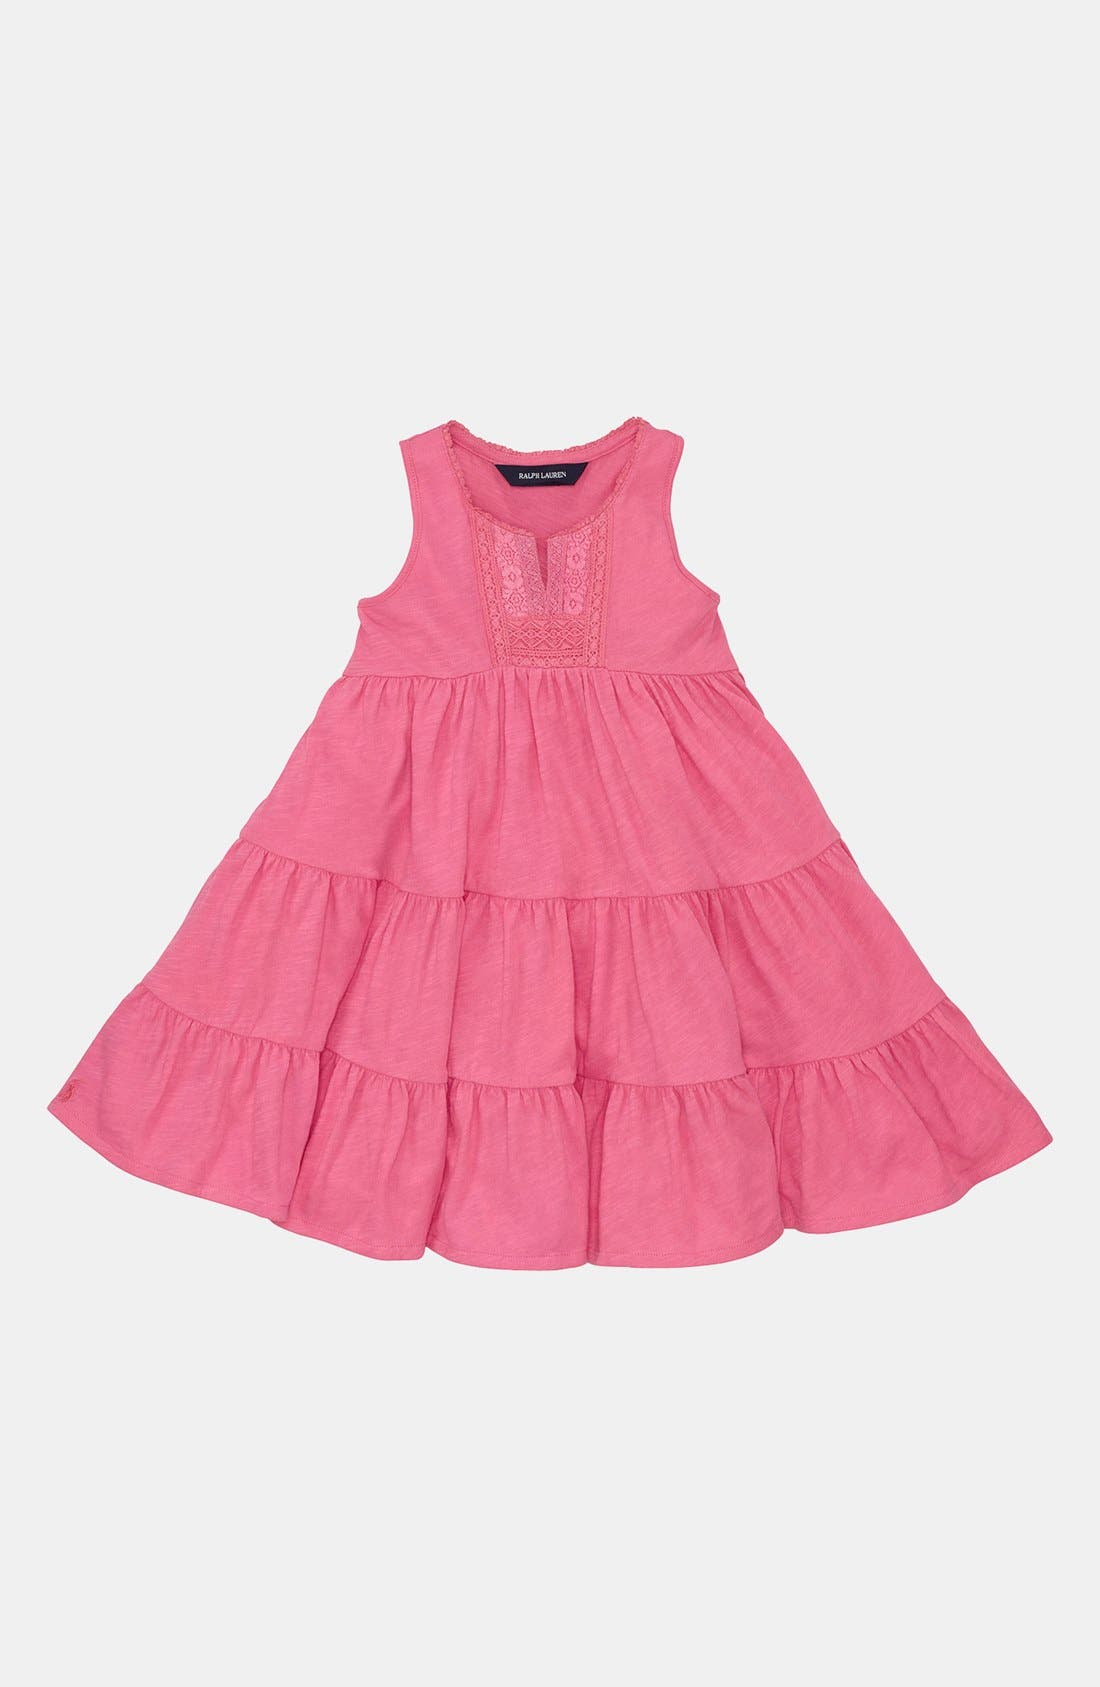 Main Image - Ralph Lauren Sleeveless Dress (Toddler Girls)